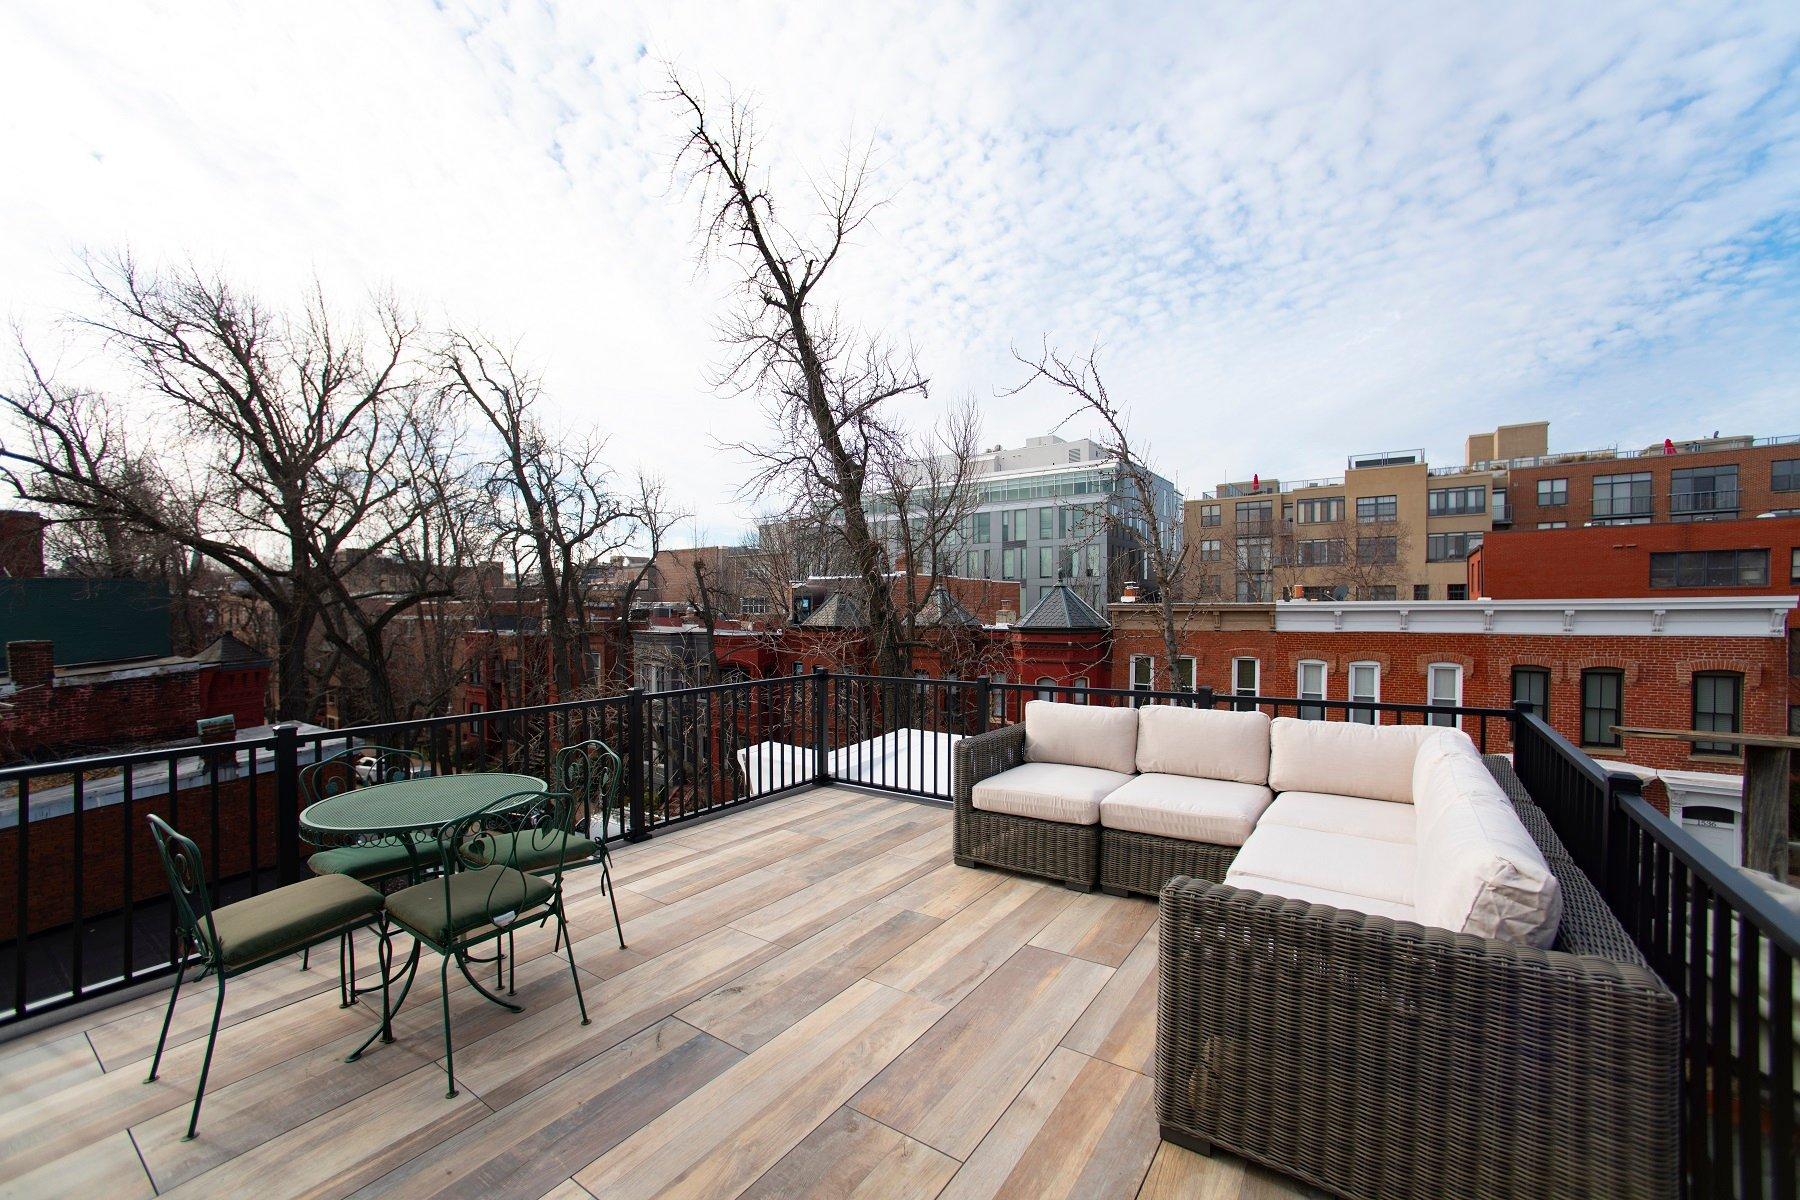 logans-circle-rooftop-deck-with-archatrak-deck-tiles (3)